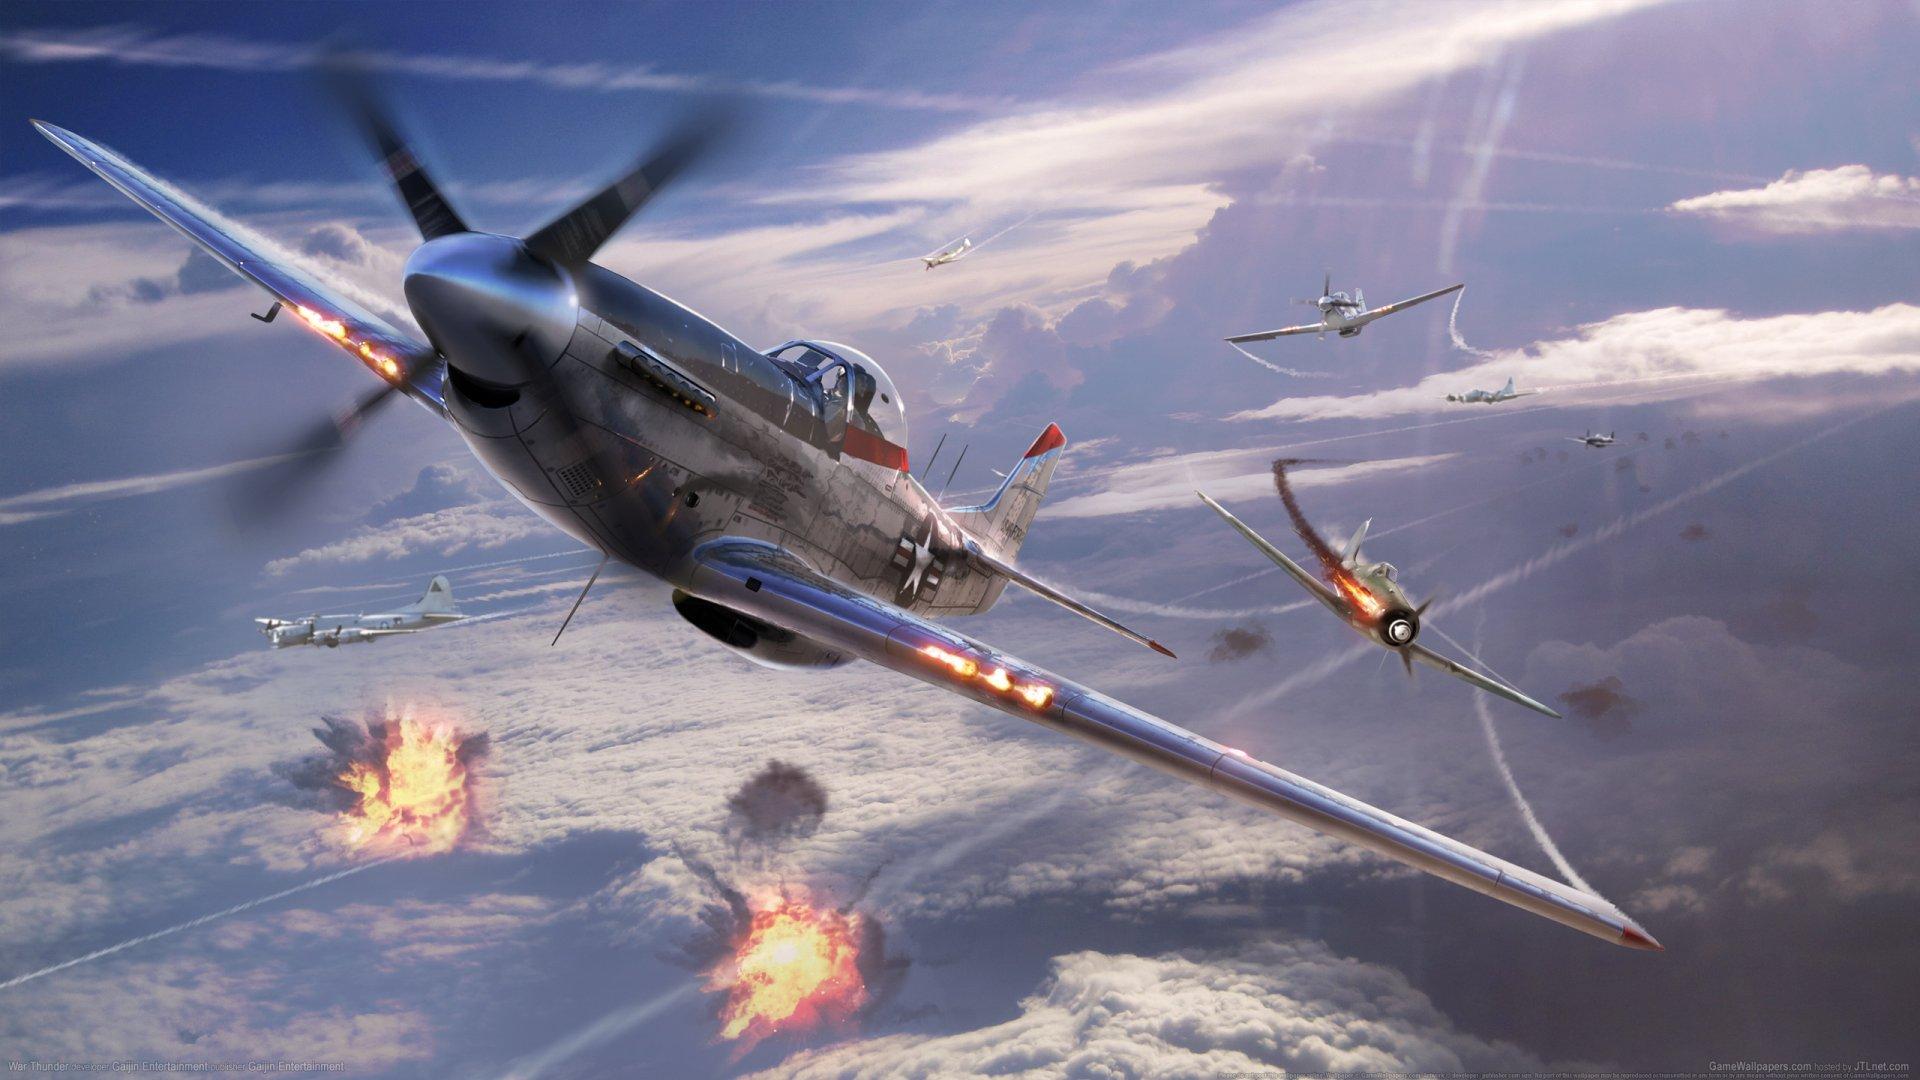 War Thunder Wallpaper - WallpaperSafari